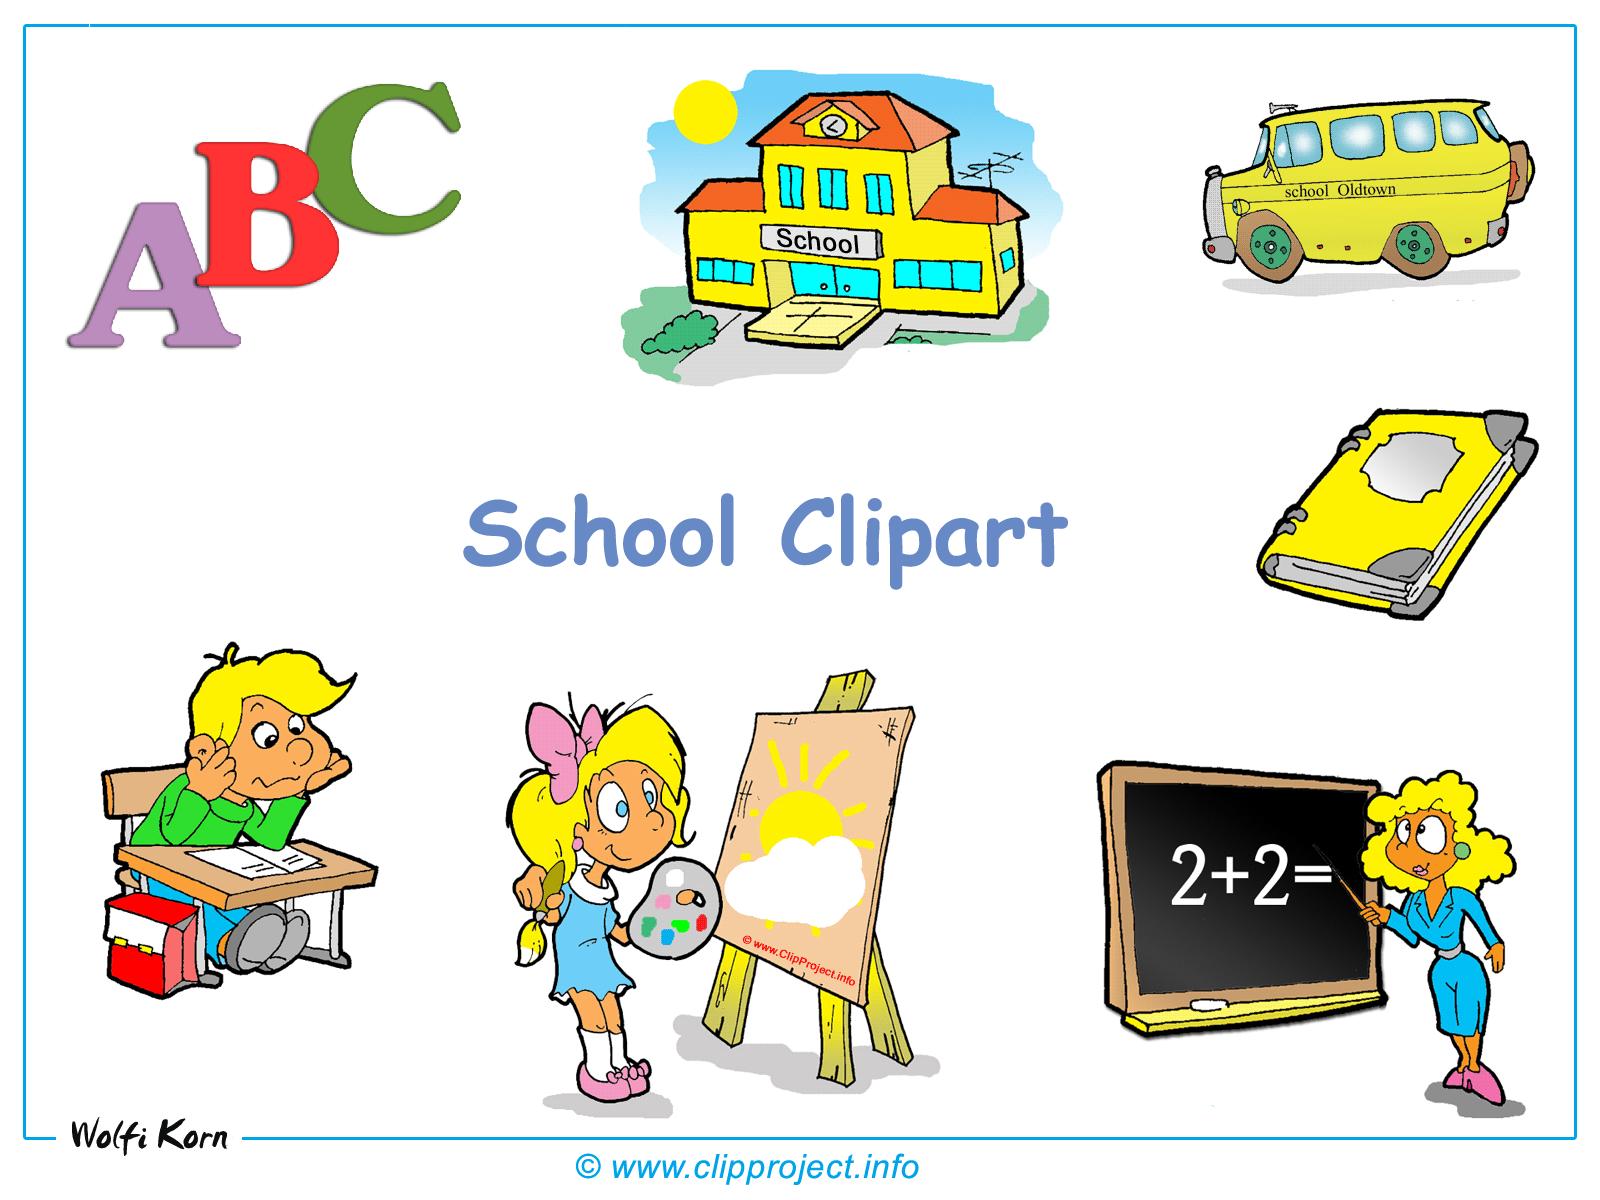 Clipartfest clipart school desktop. Background cliparts free download